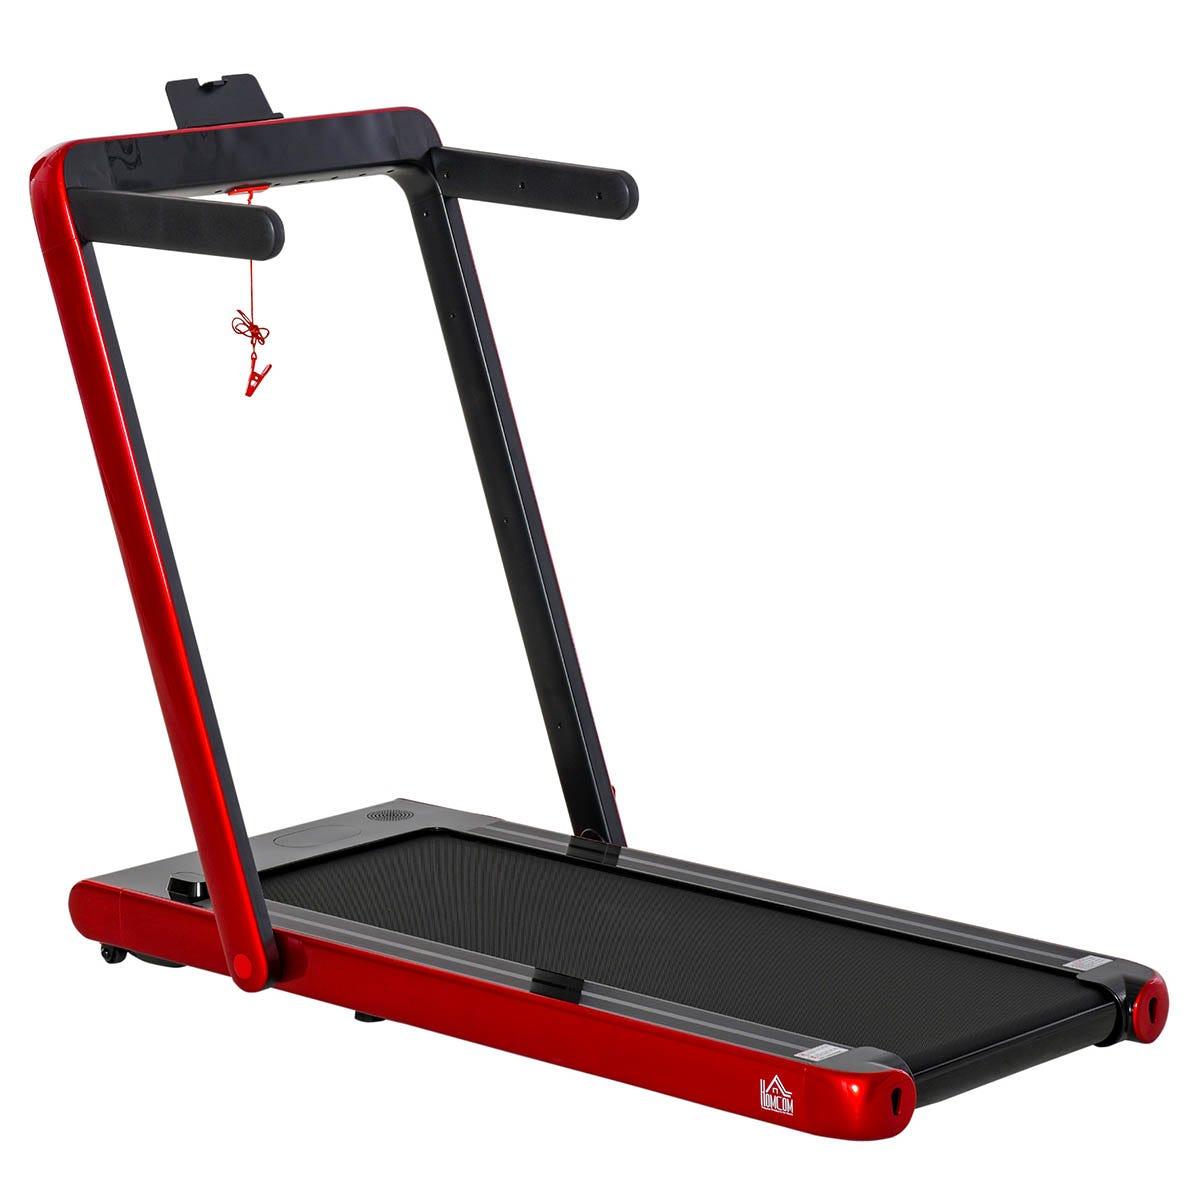 HOMCOM Electric Folding Treadmill Home Running Walking w/ Speaker, Red